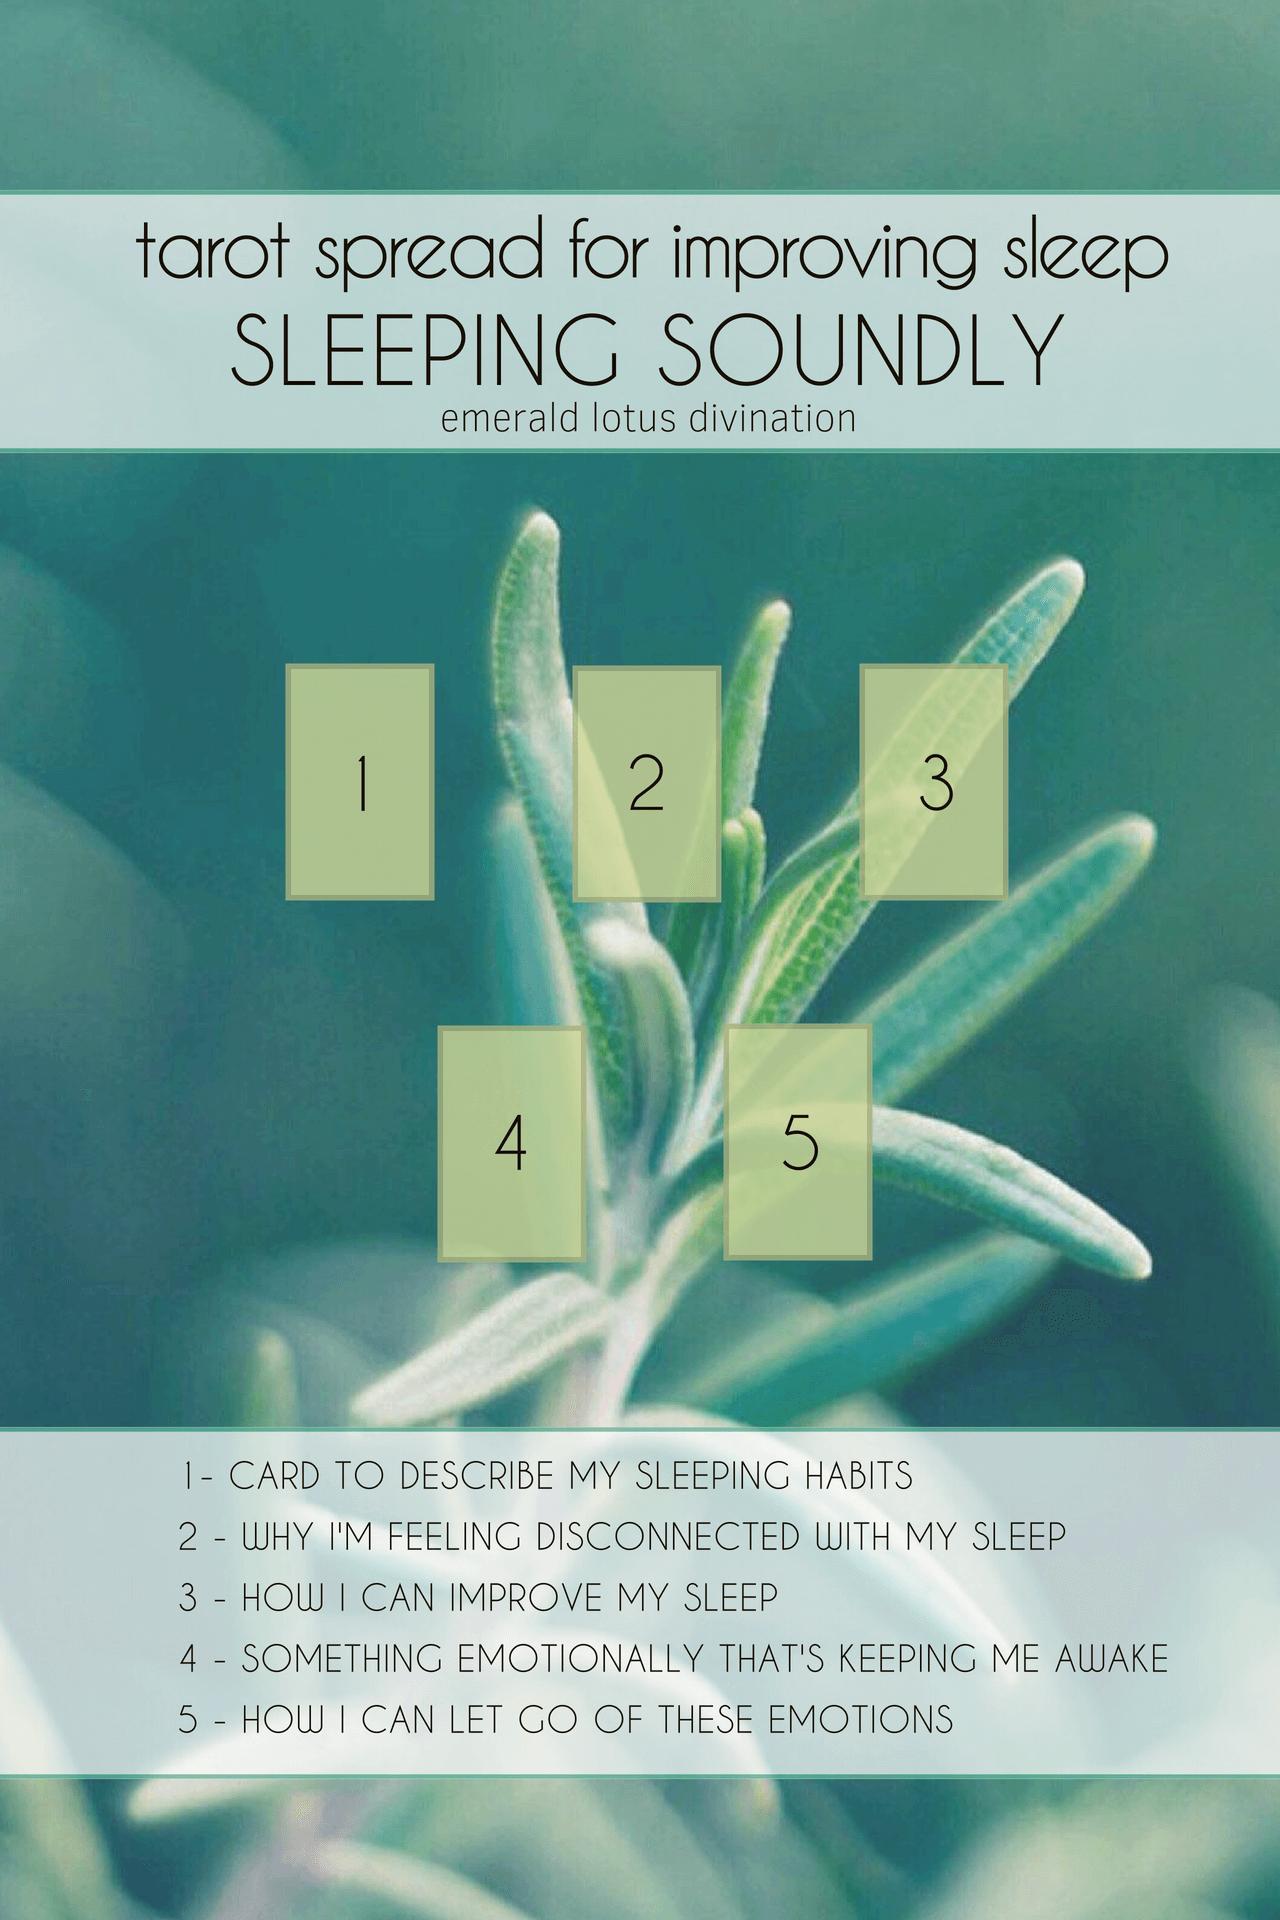 sleeping-soundly-tarot-spread-improving-sleep-1.png